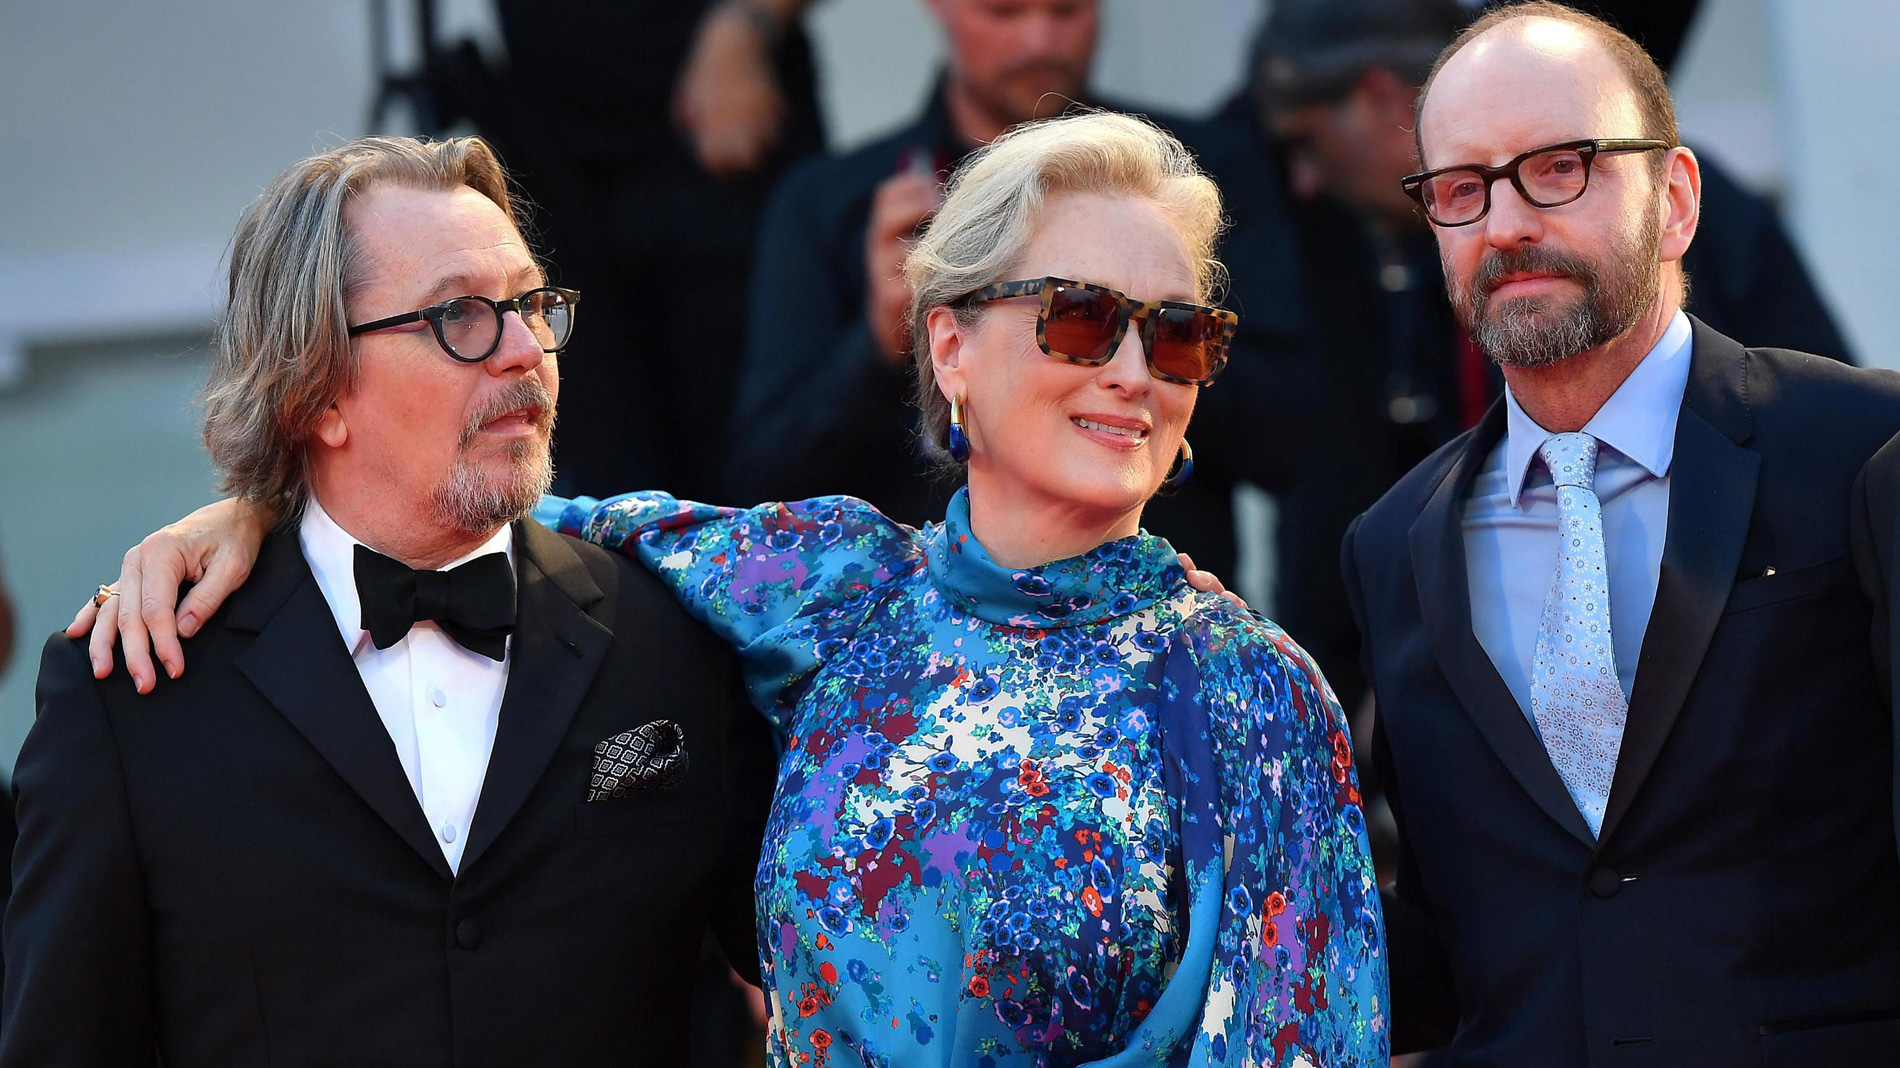 Ir al VideoMeryl Streep presenta en la Mostra de Venecia una comedia negra sobre los Papeles de Panamá